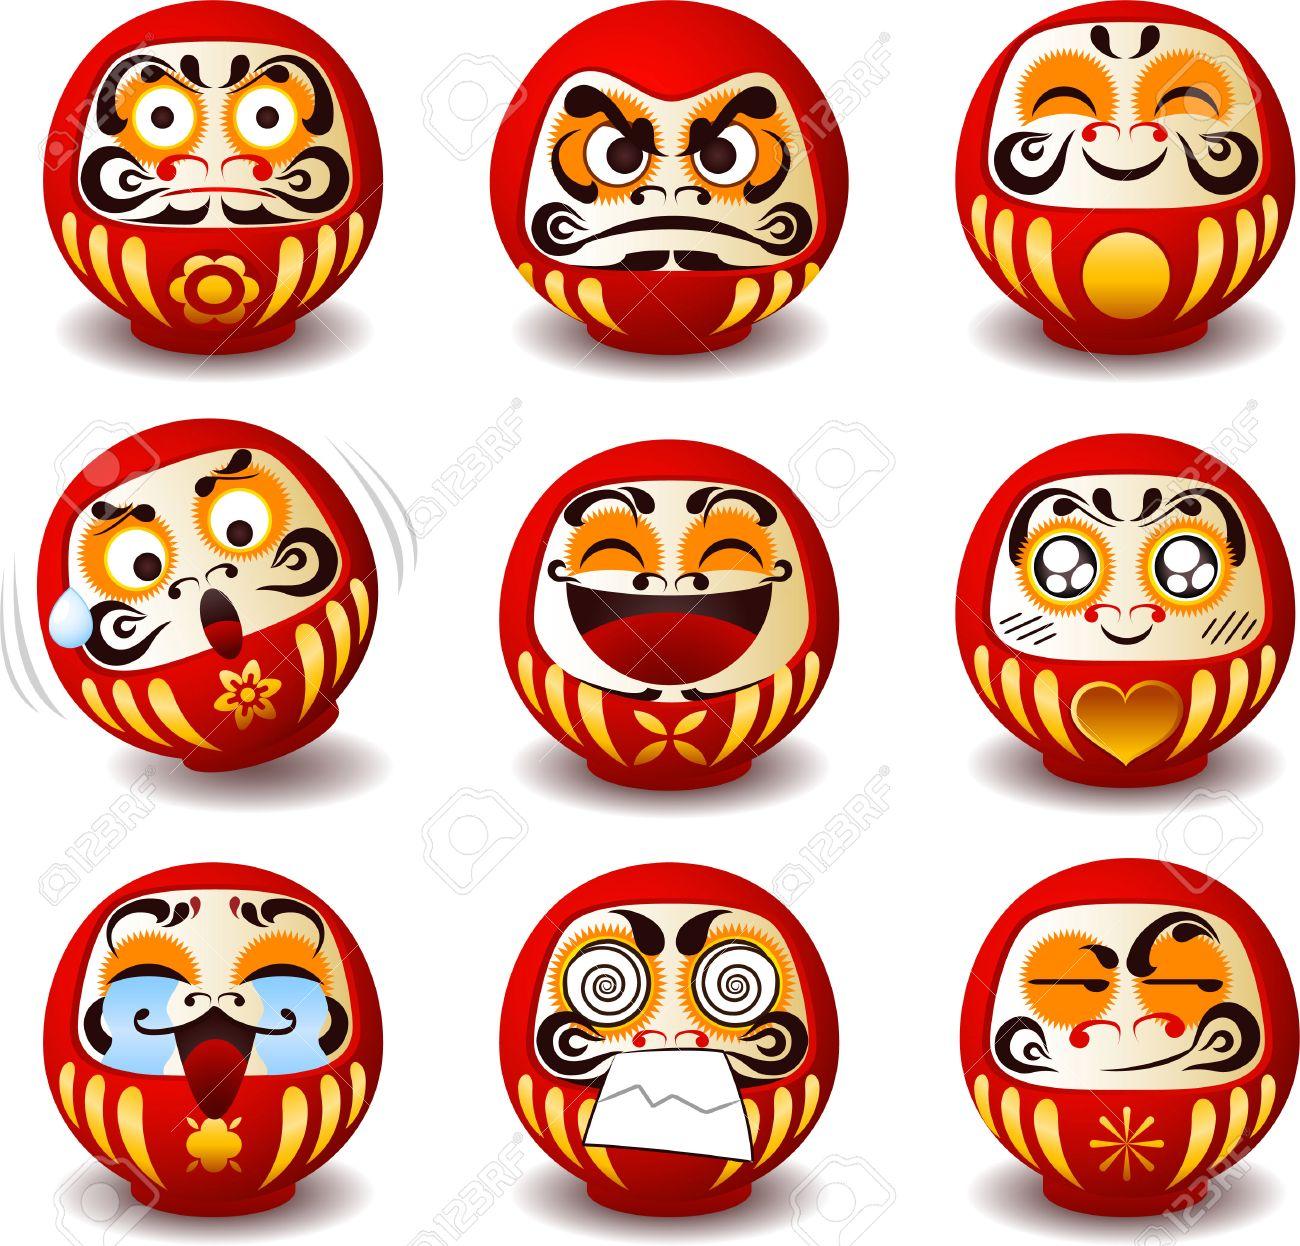 Daruma, Daruma, Dharma-Puppe, Dharma, Runde, Traditionelle ...